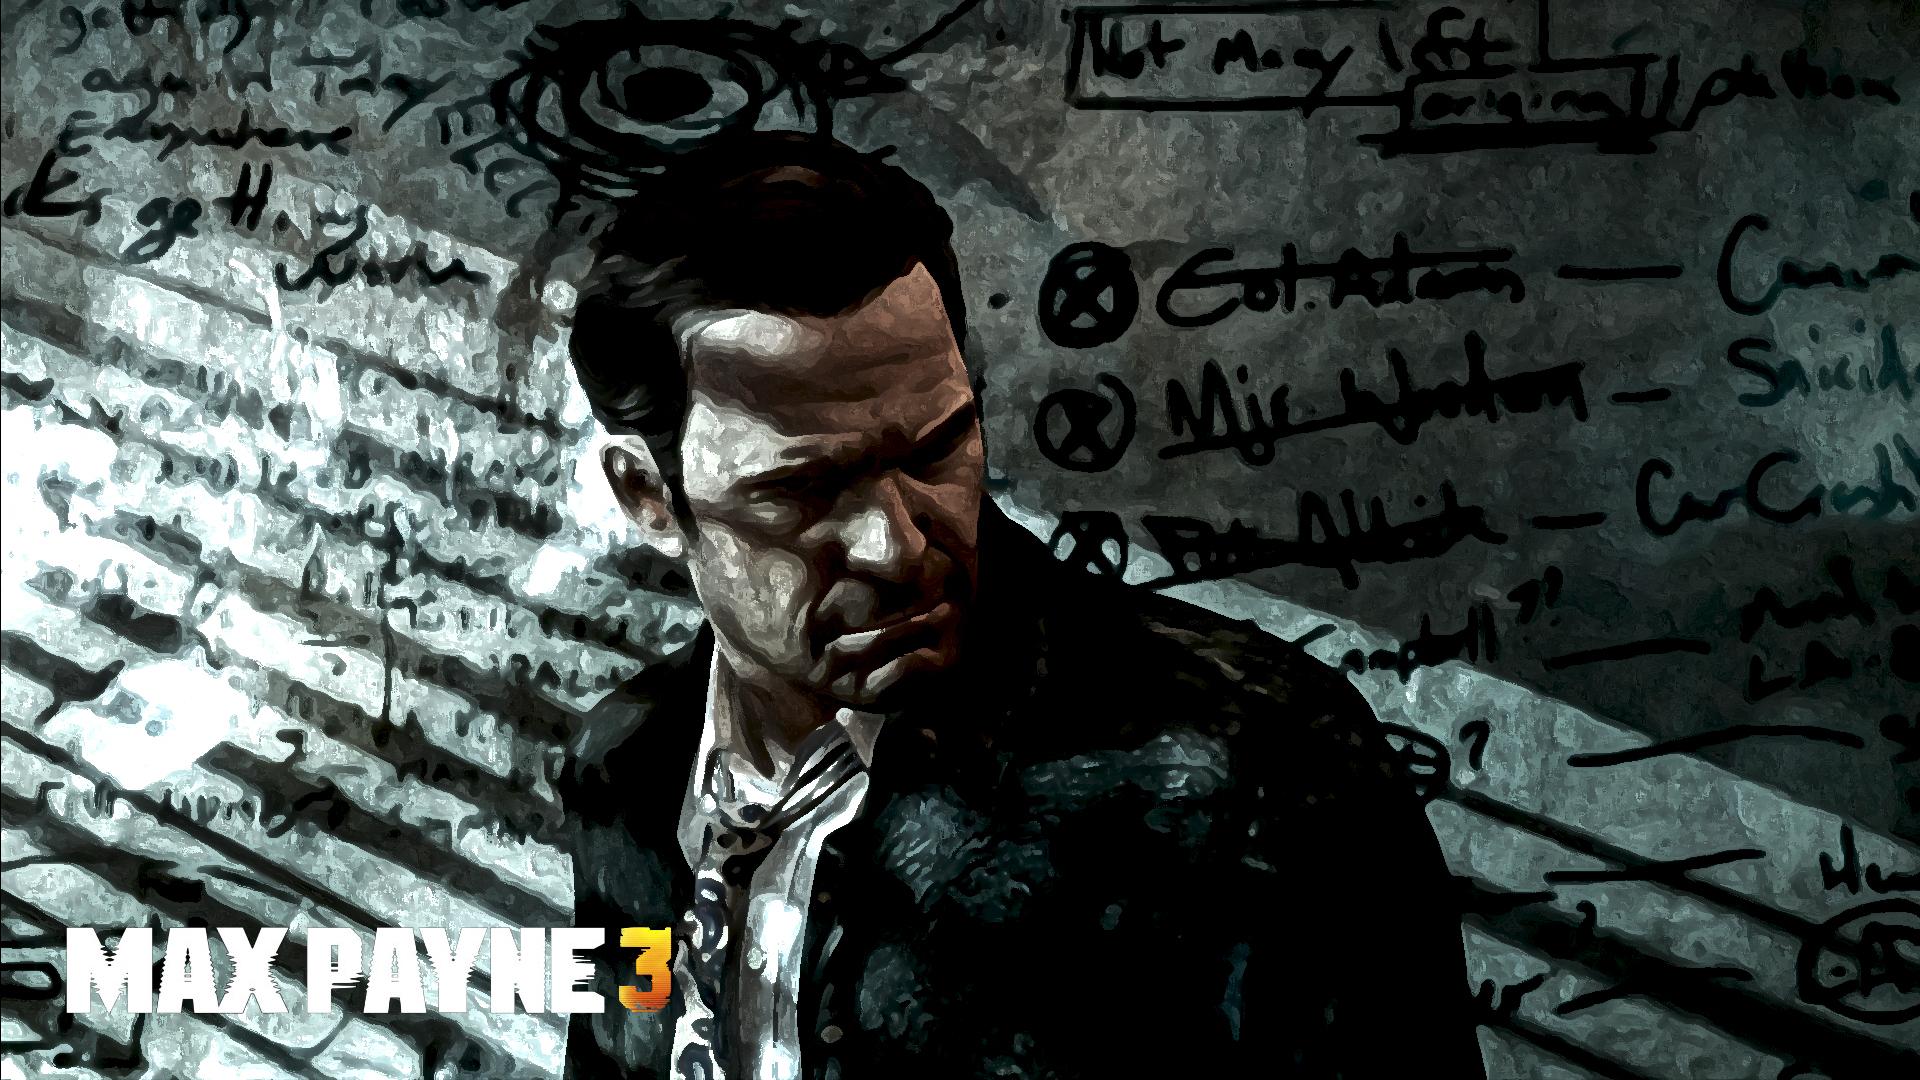 Wallpaper Max Payne 3 Max Payne 1920x1080 Krimo9306 1739137